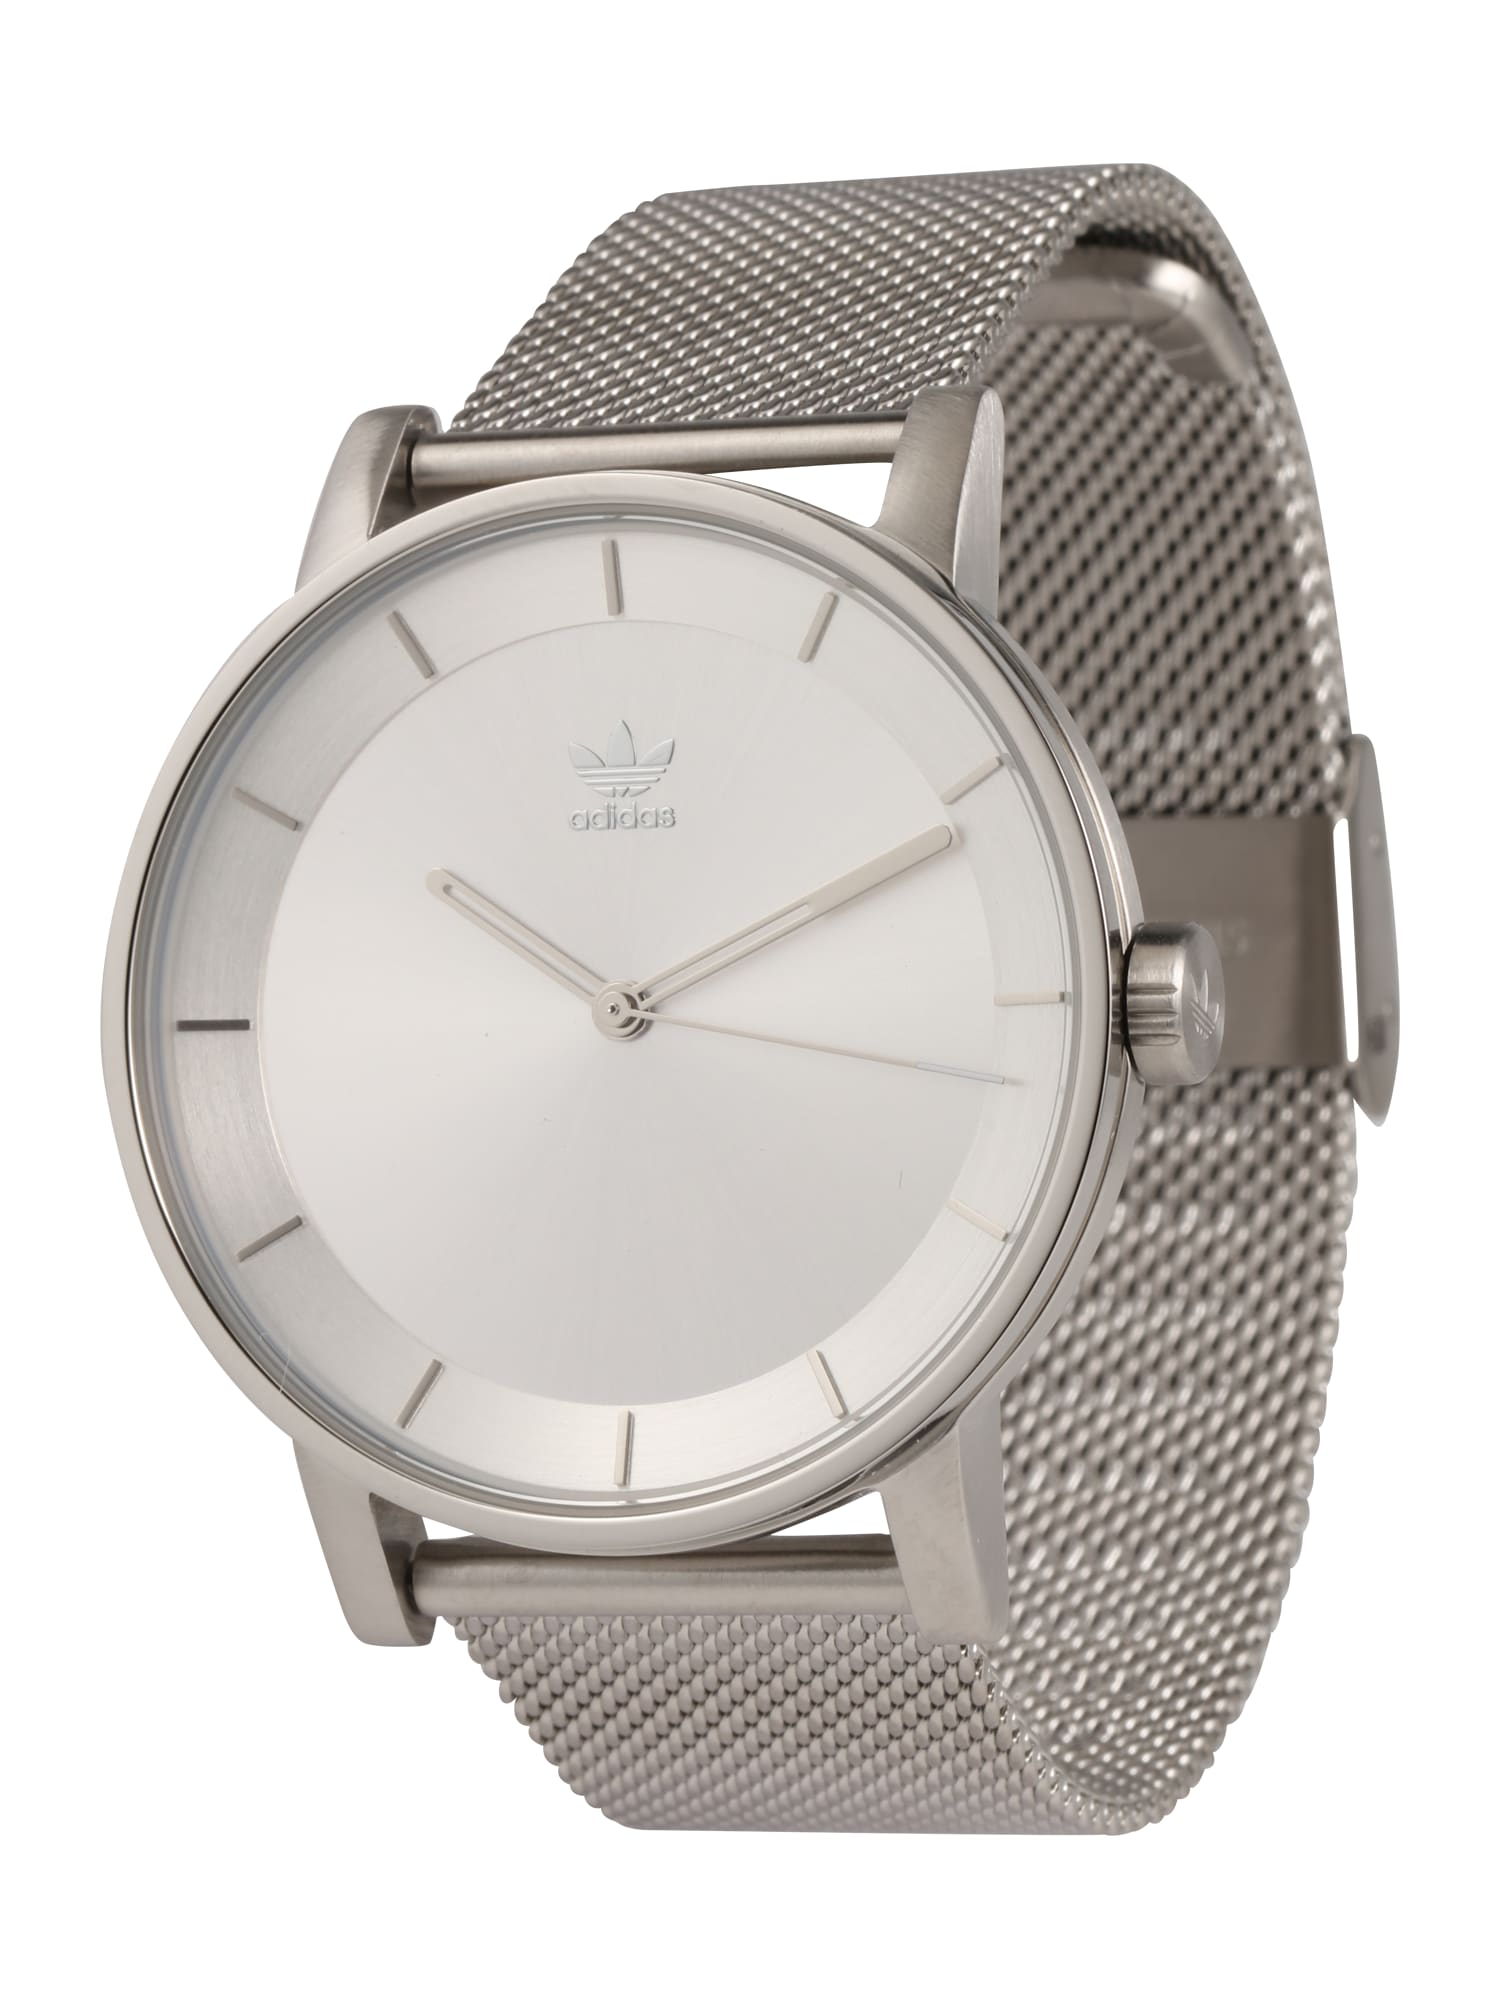 Analogové hodinky District_M1 stříbrná ADIDAS ORIGINALS